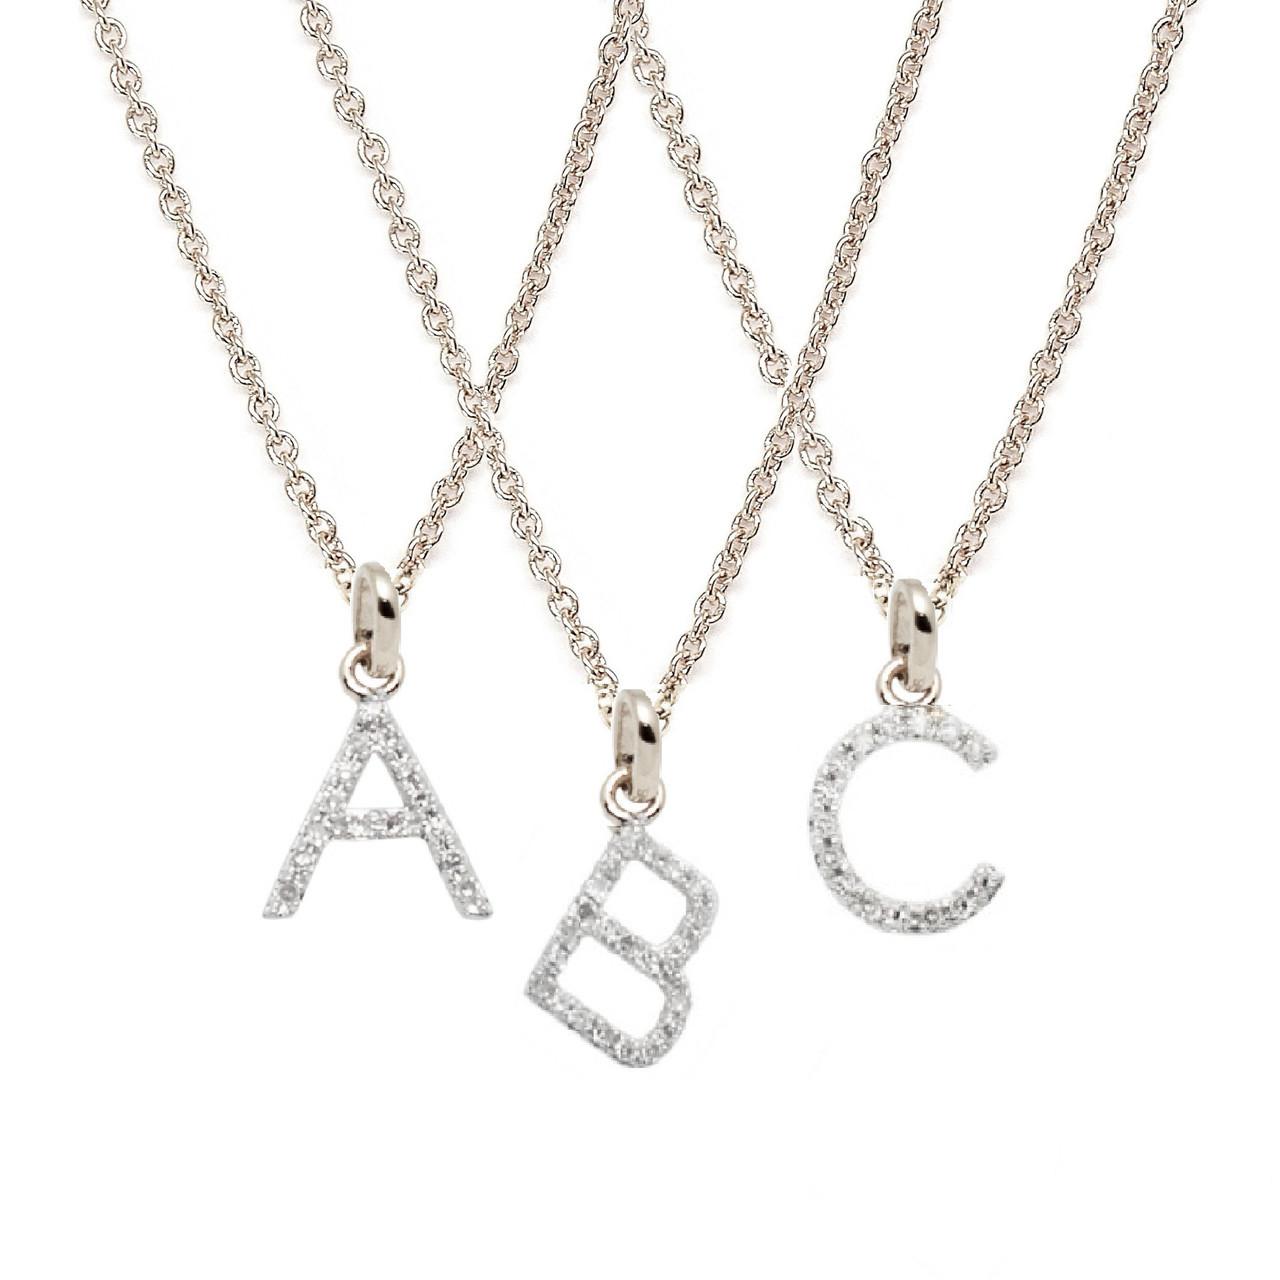 Rachael ryen white gold petite diamond letter necklace for Letter d diamond pendant